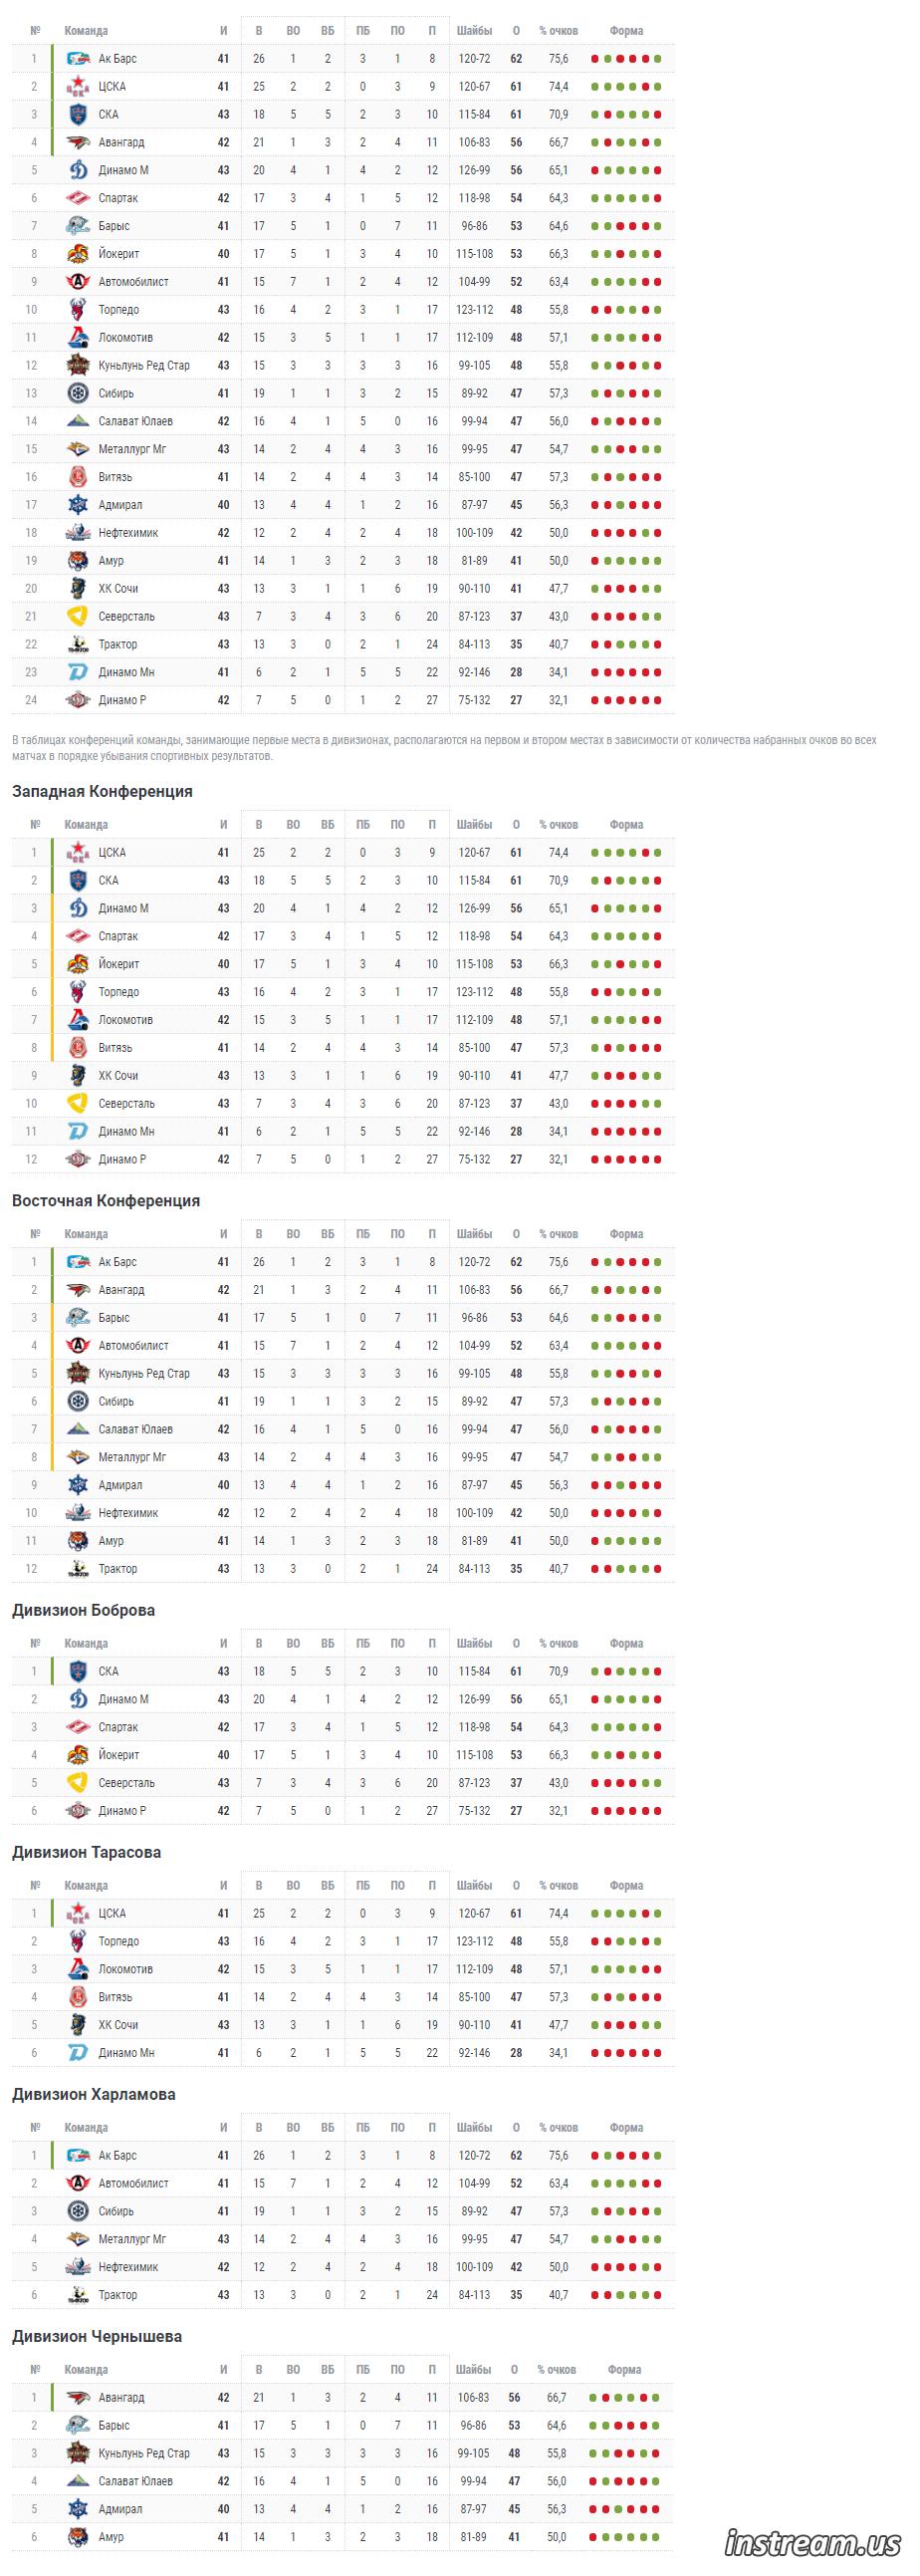 КХЛ 2019-2020 турнирная таблица